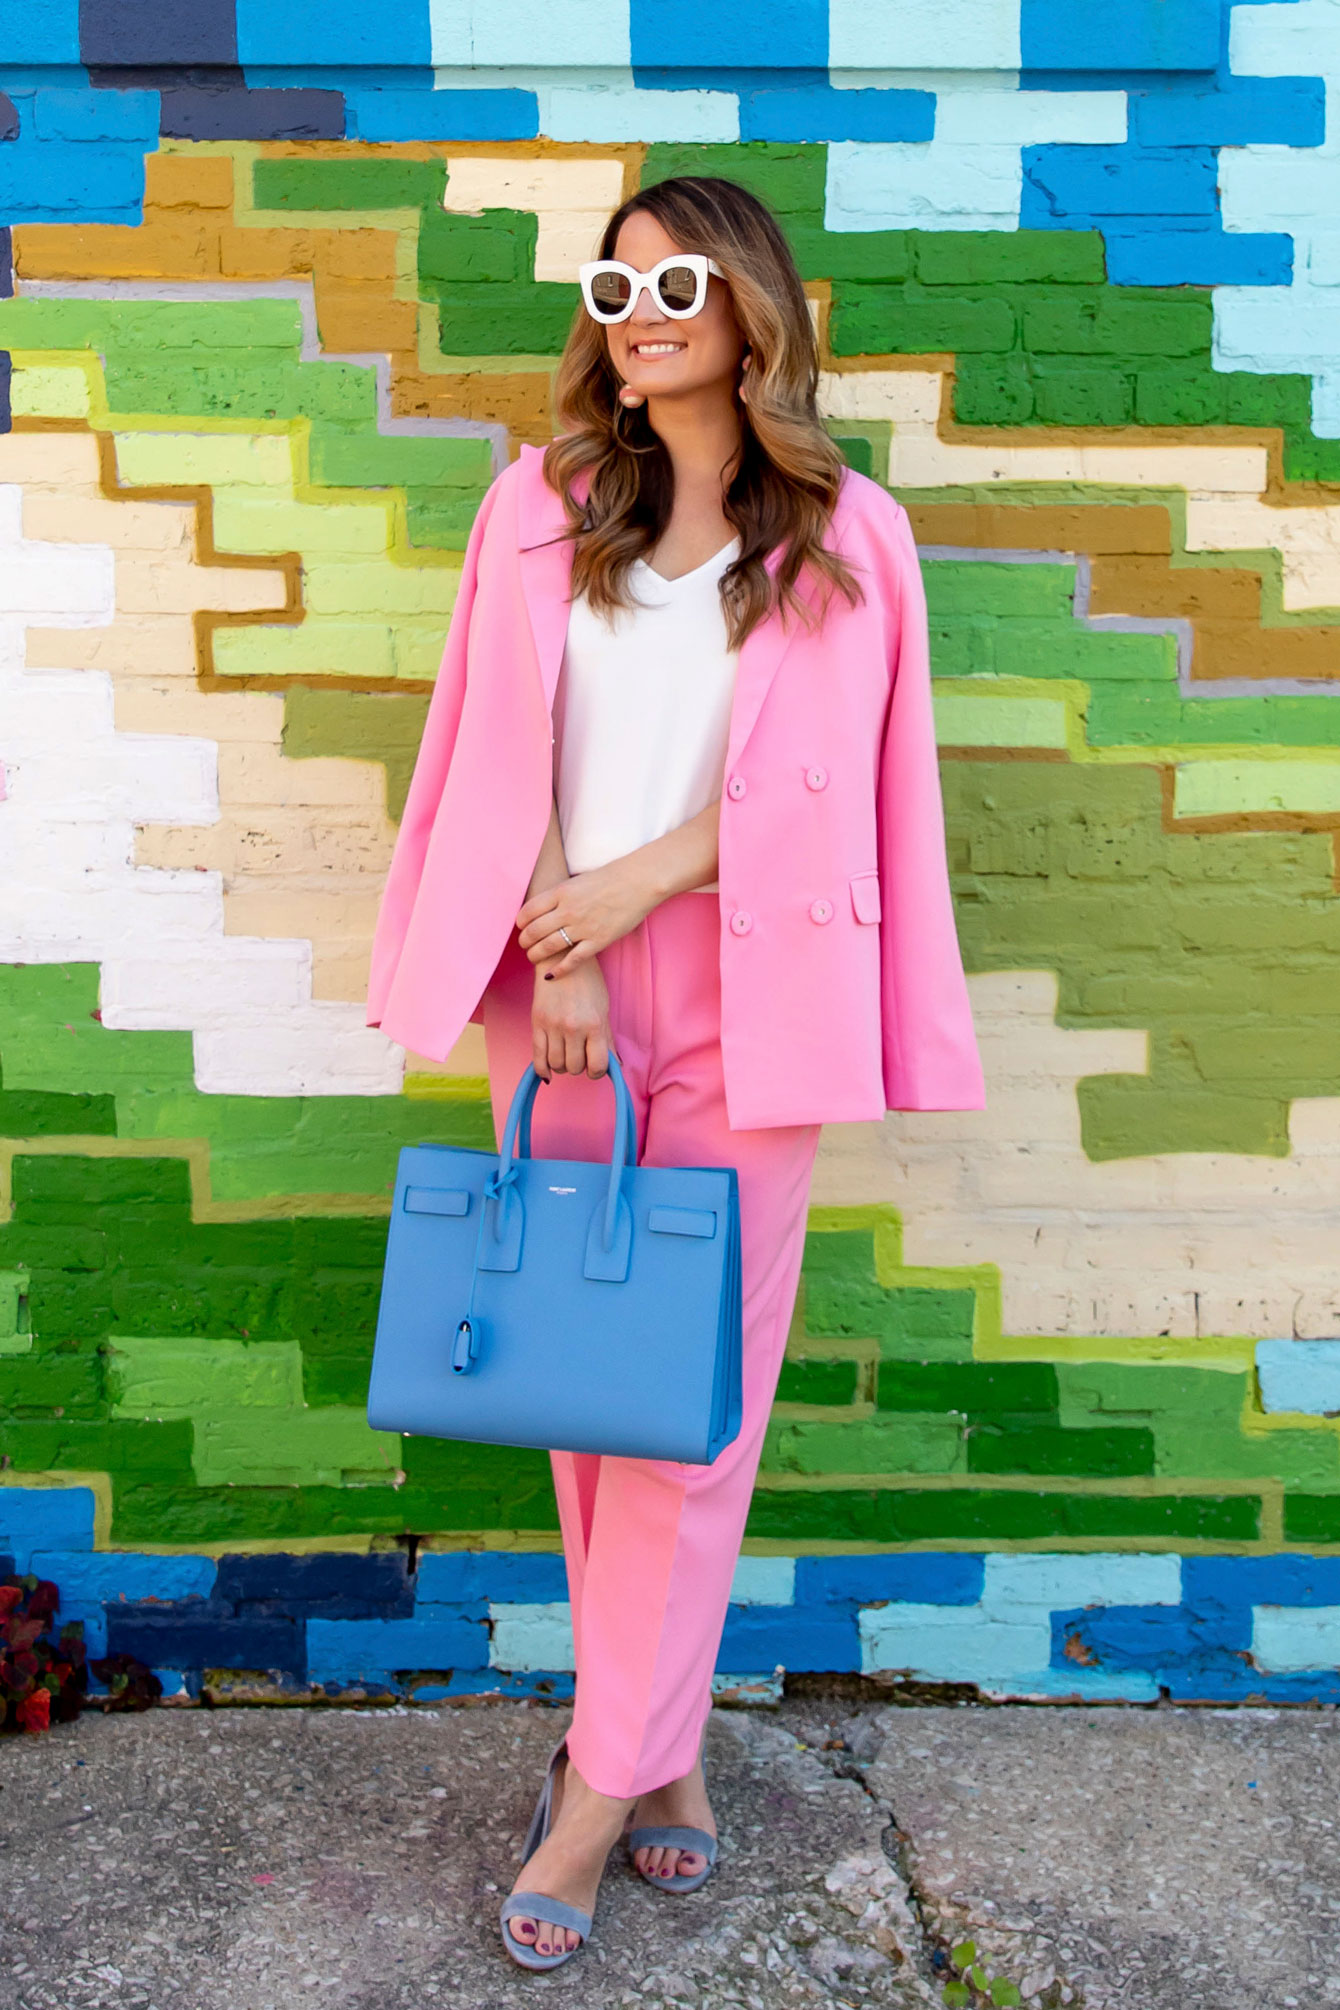 Nordstrom Pink Suit